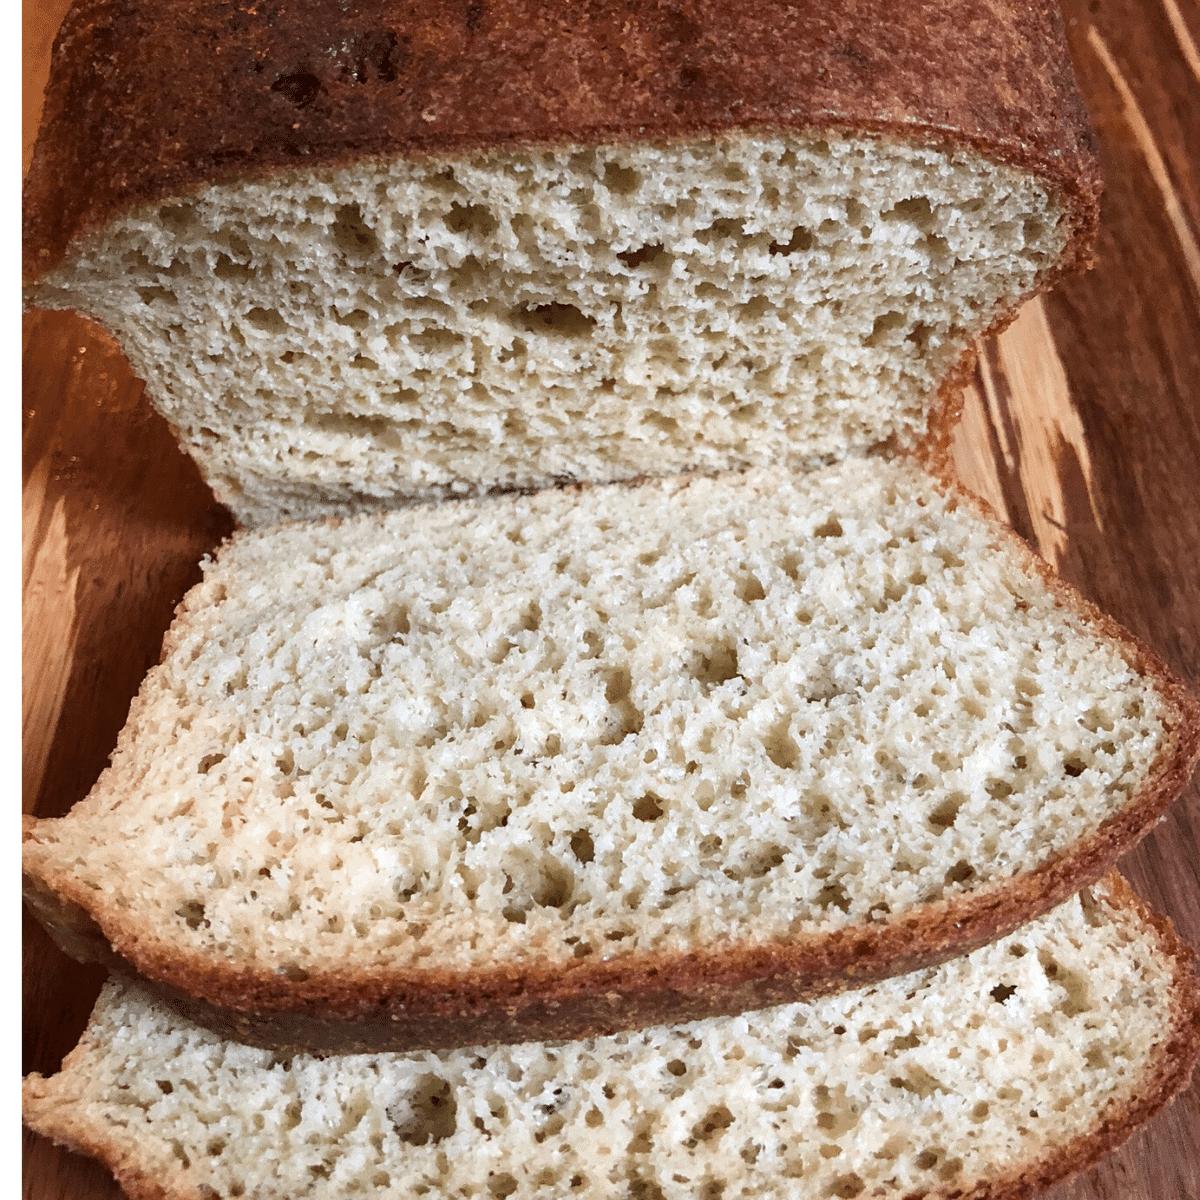 # 1 Swoon-Worthy Keto Almond Flour Yeast Bread Recipe